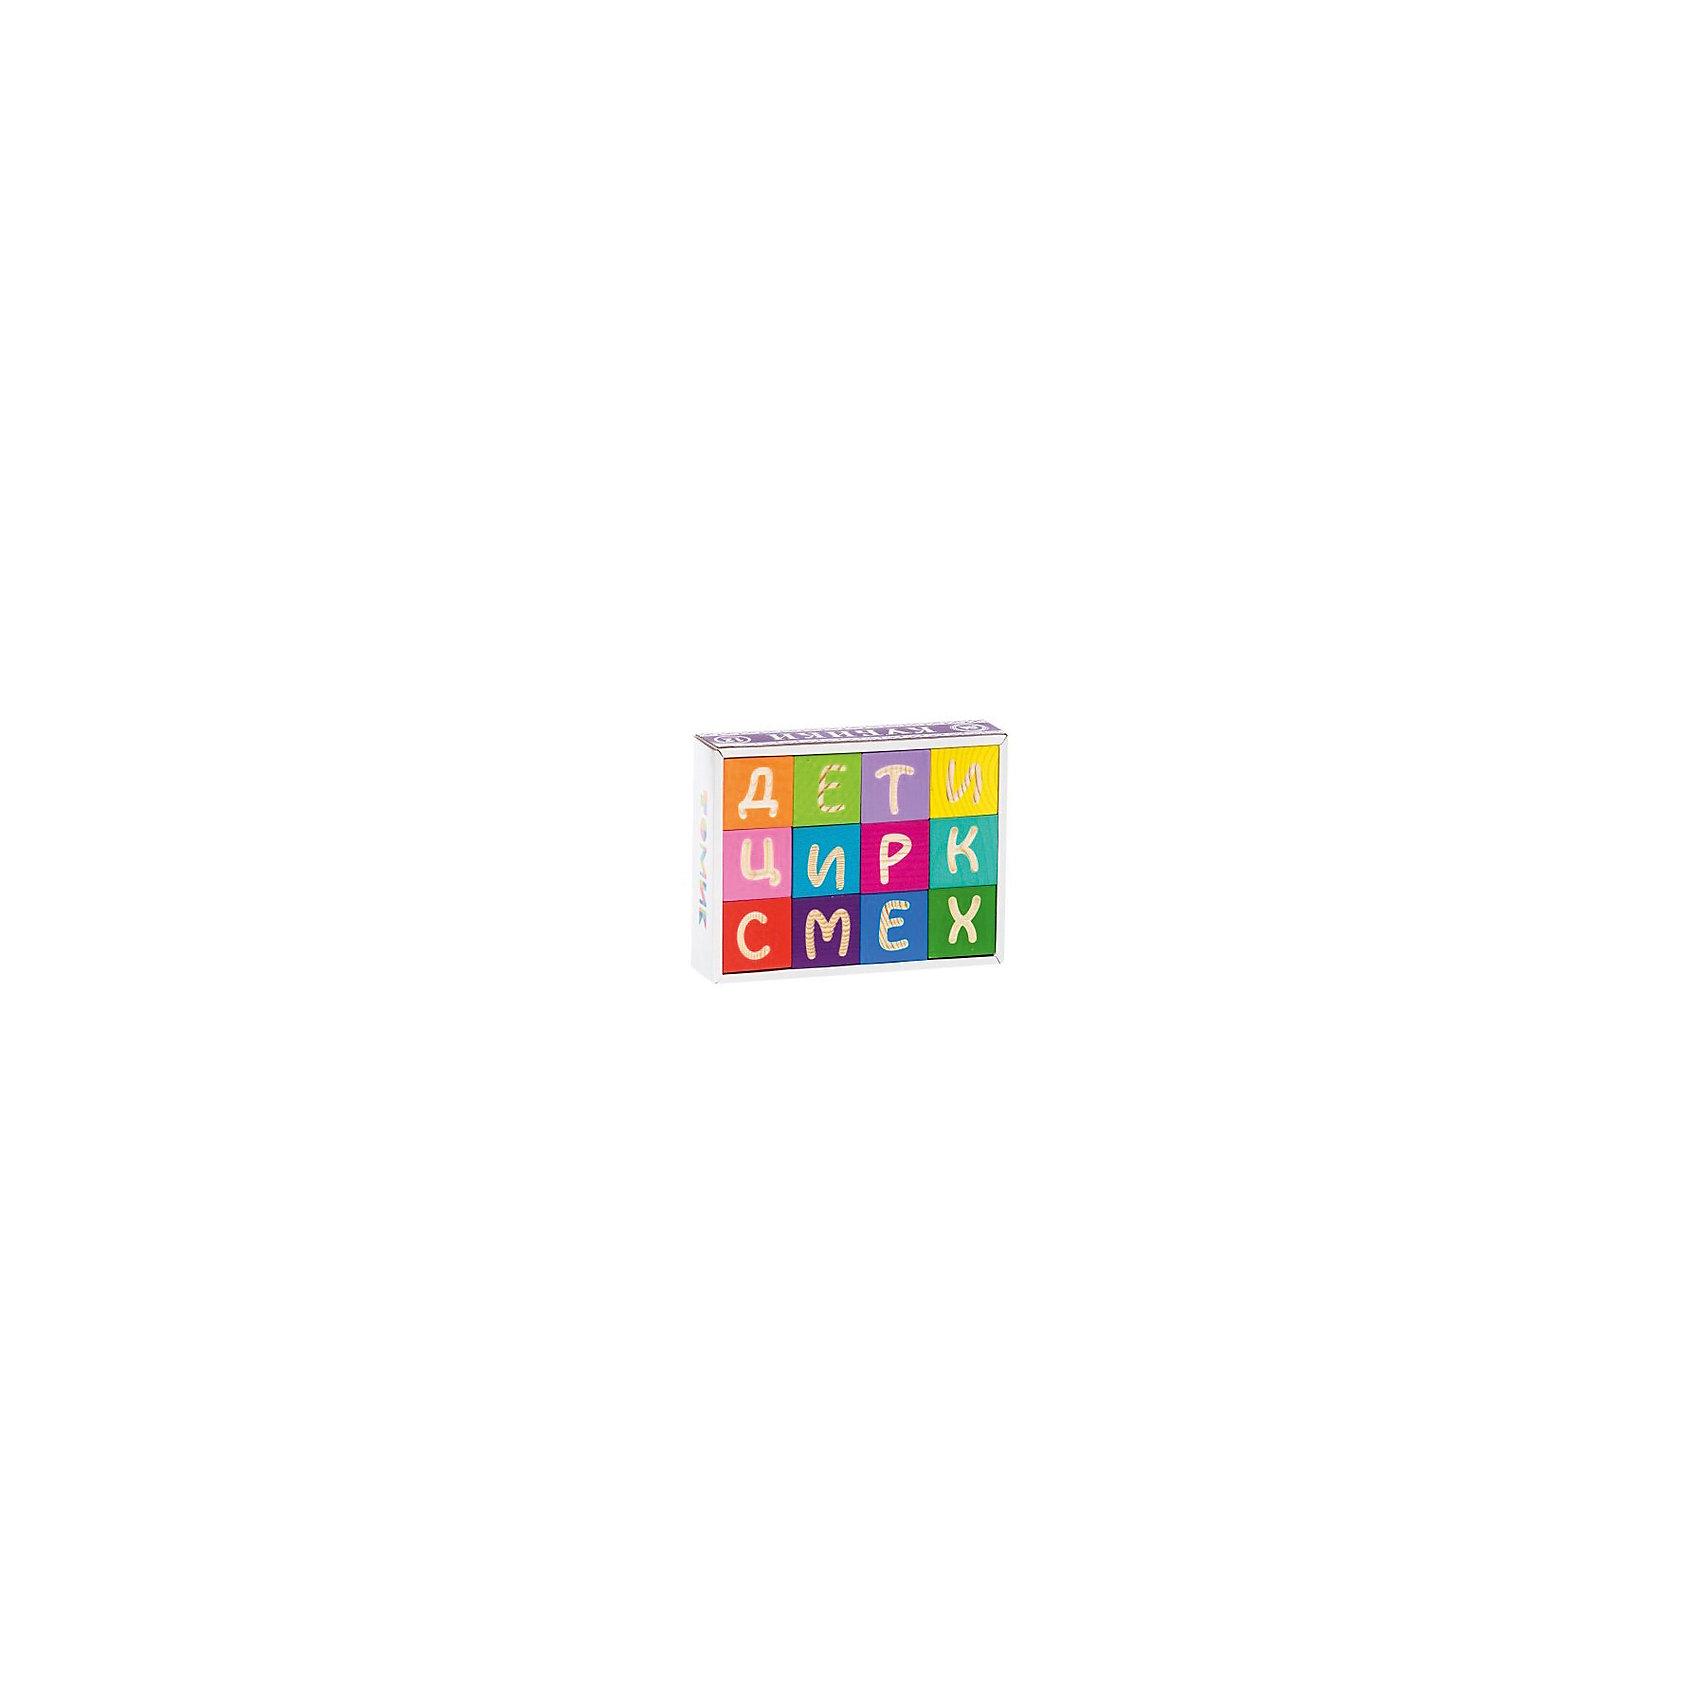 кубики томик кубики цветные 20шт Томик Кубики Веселая азбука, 12 штук,Томик